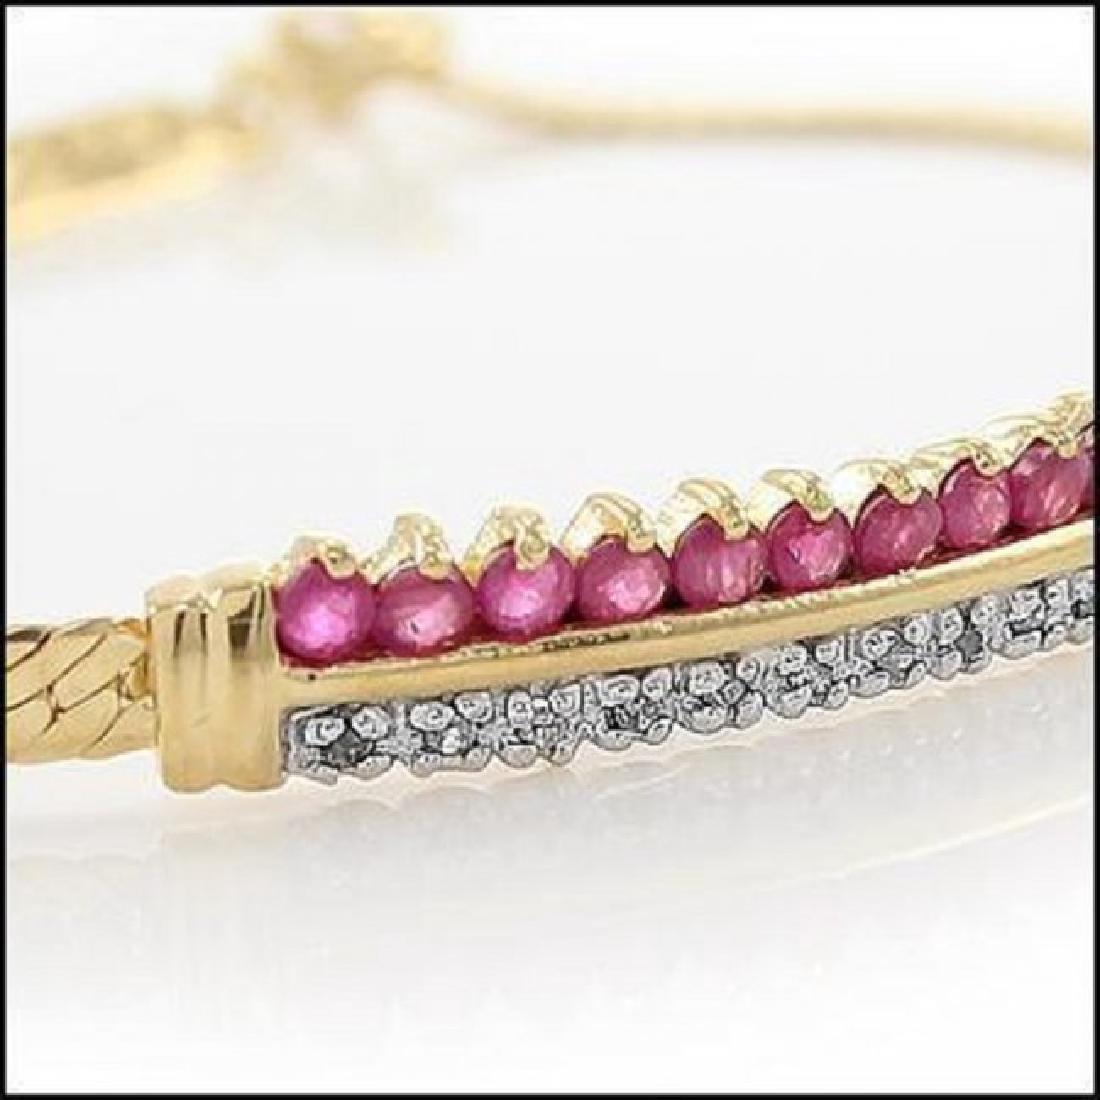 3.39 CT Ruby & Diamond Designer Bracelet $960 - 2